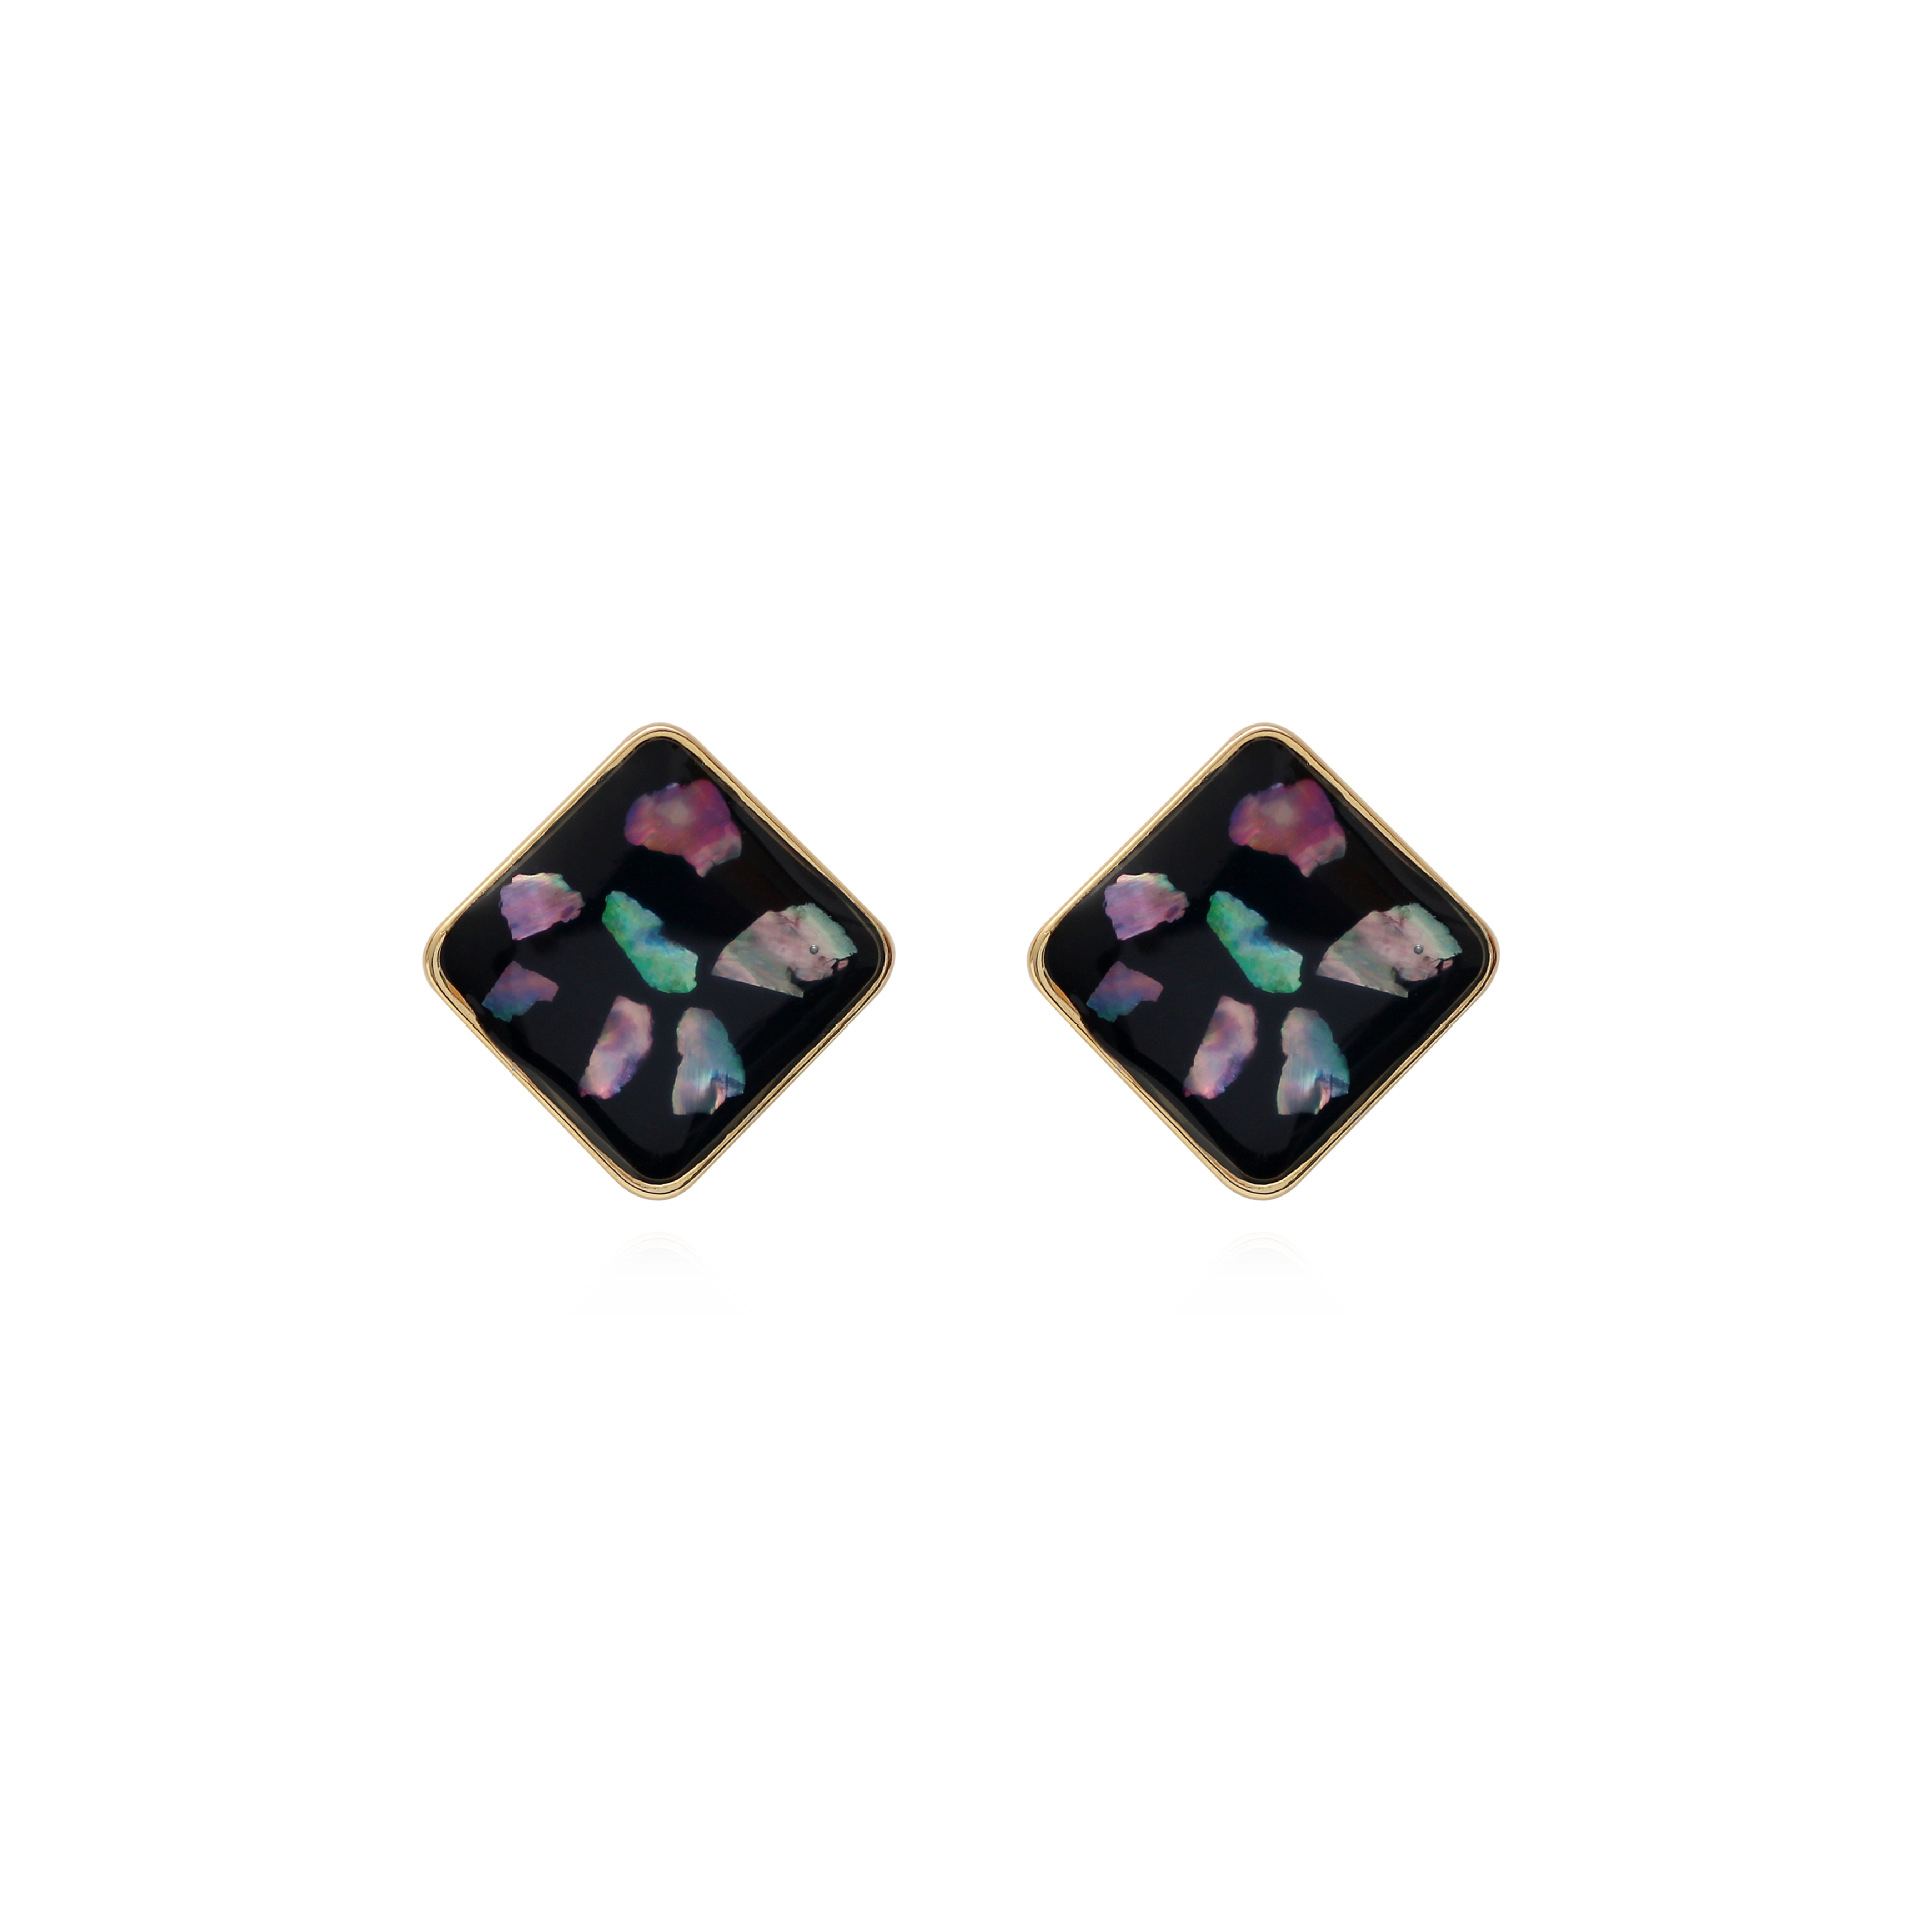 GWACC Fashion Original Creative Rectangular Stud Earrings For Women Girls Korea Vintage Drip Earrings Fashion Jewelry 3 Colors in Stud Earrings from Jewelry Accessories